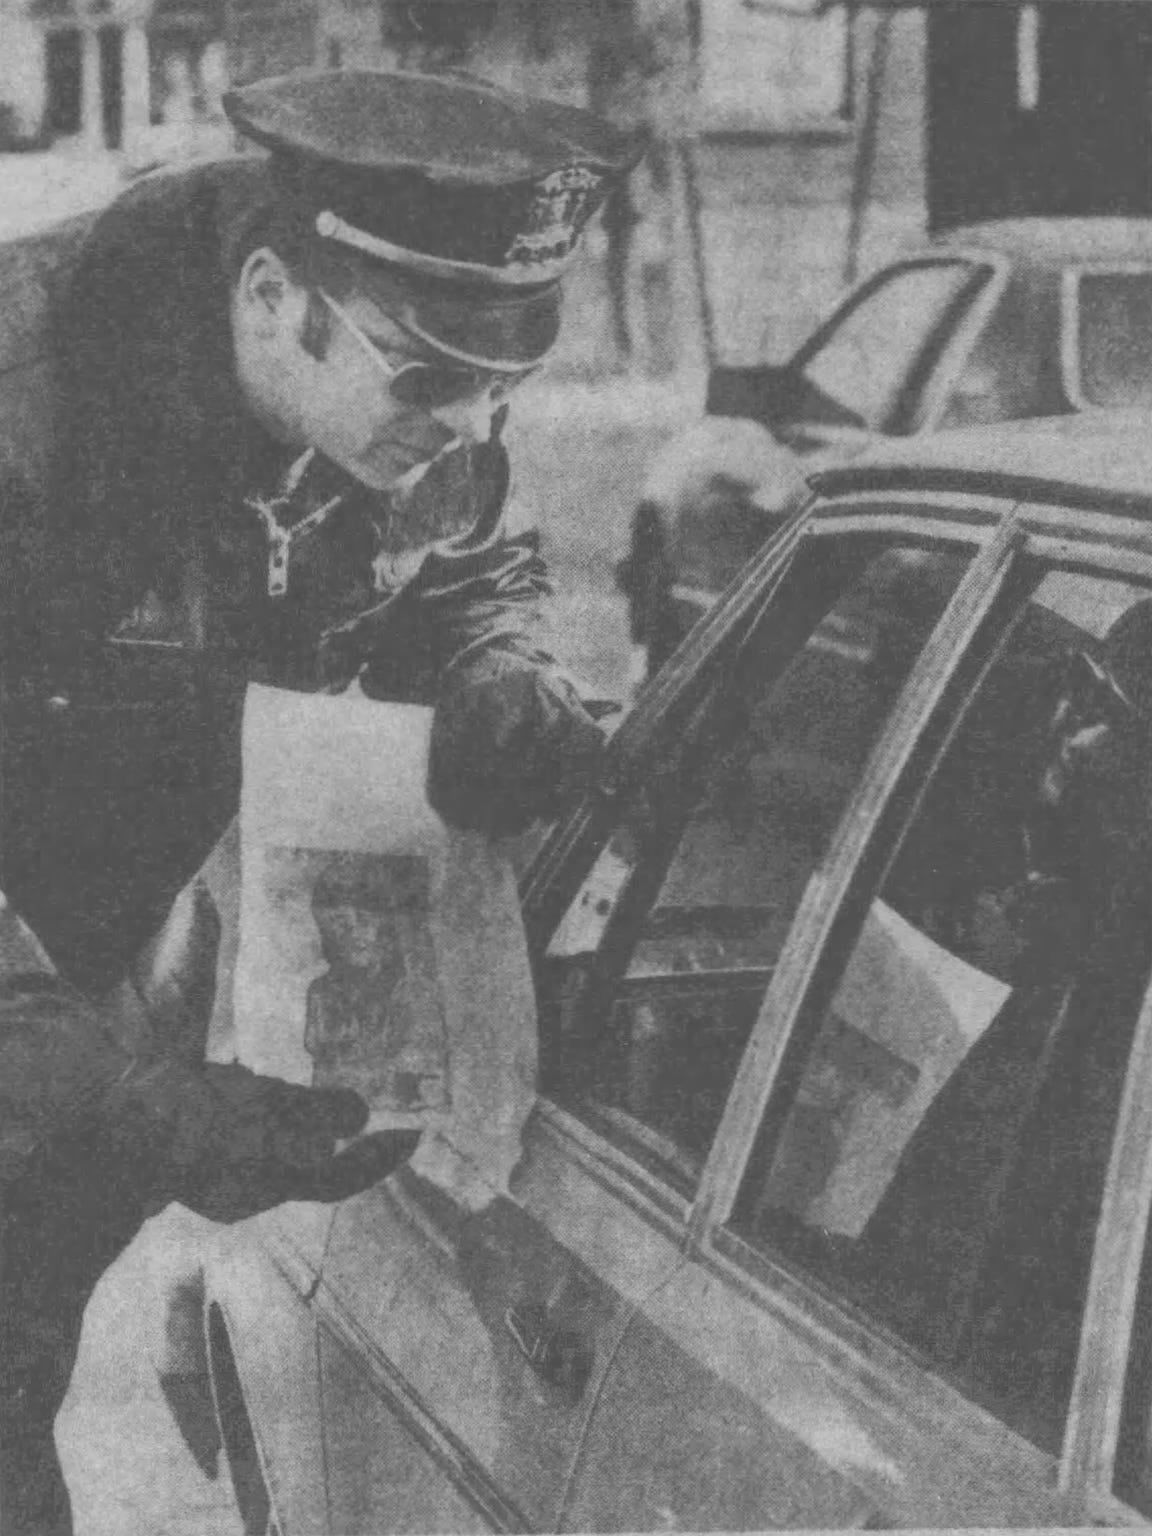 Binghamton Police Sgt. James Lewis shows Cheri Lindsey's